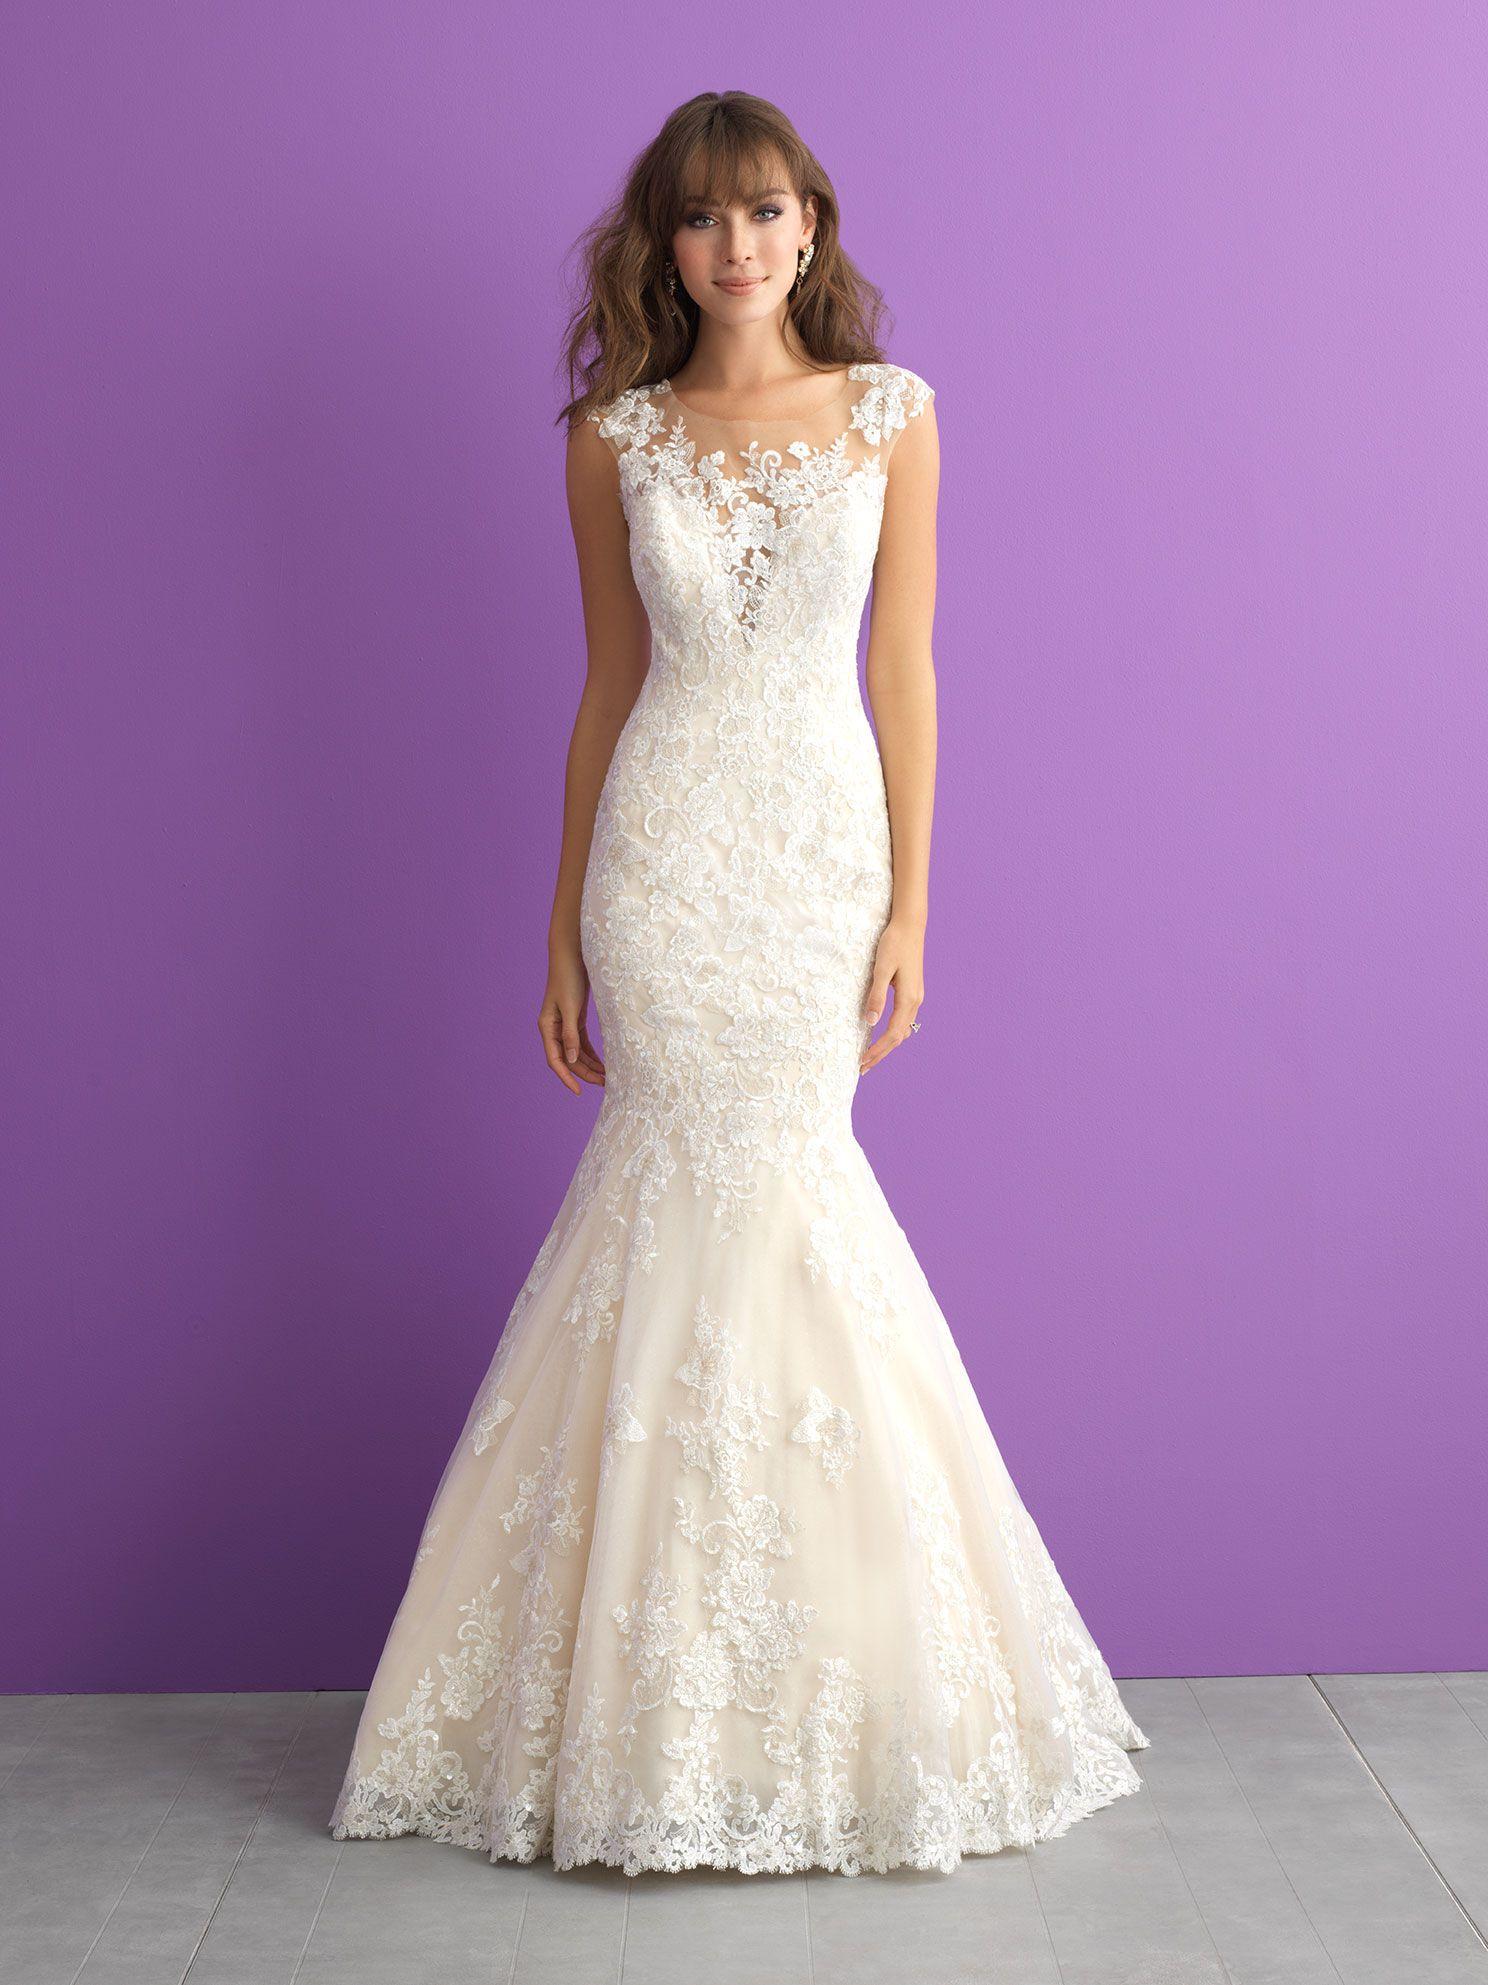 Vestido de Novia Allure 3003 - Maribel Arango Novias | vestido de ...